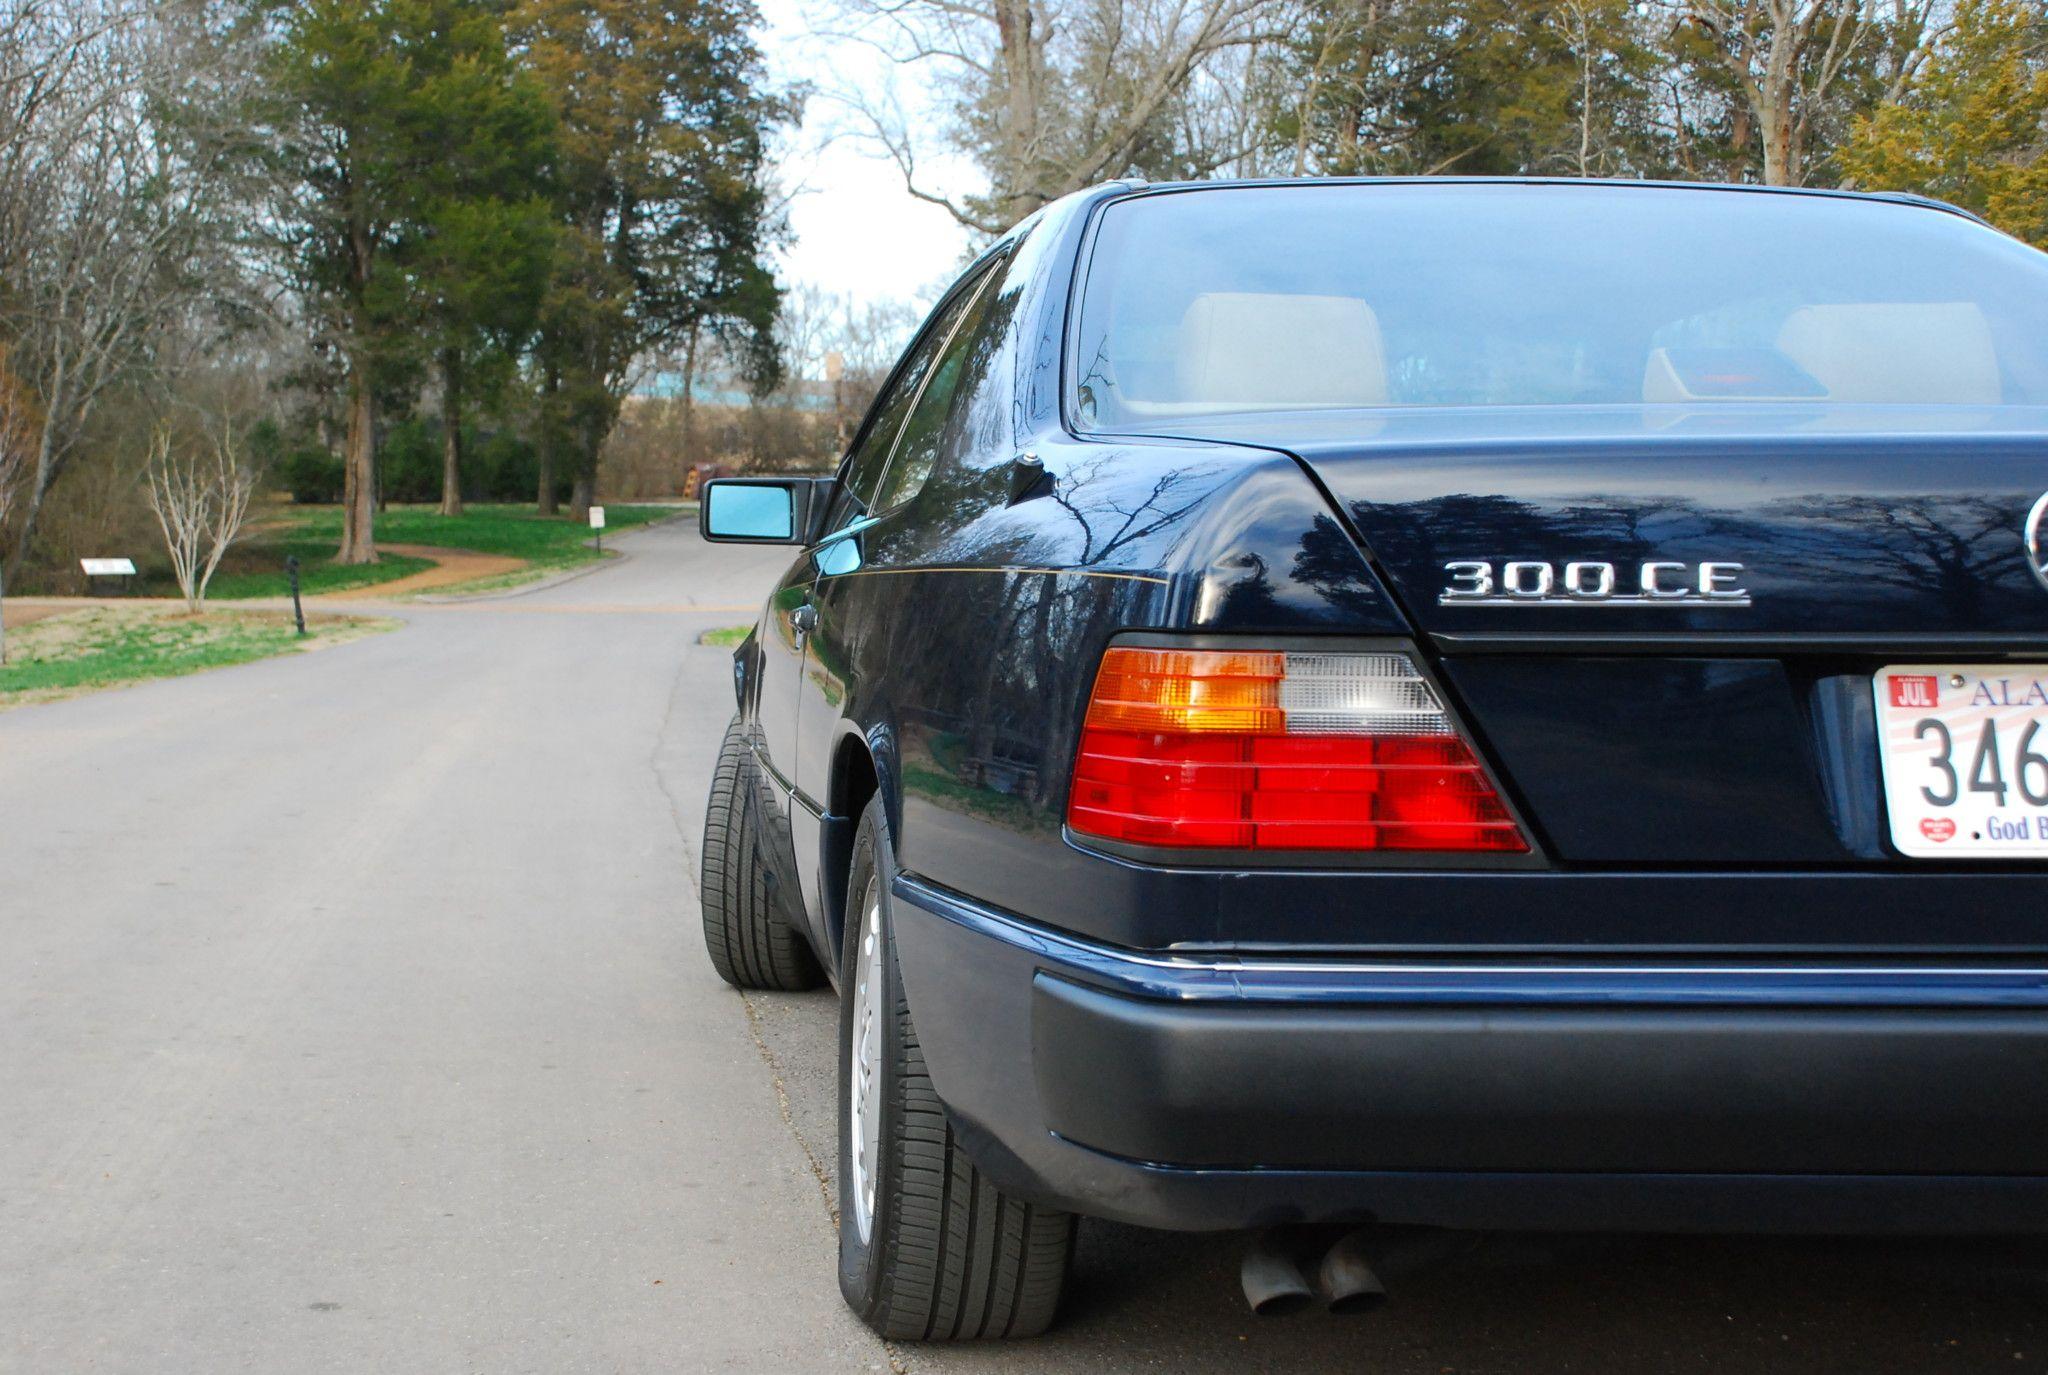 1991 Mercedes Benz 300ce Mercedes Benz Benz Mercedes